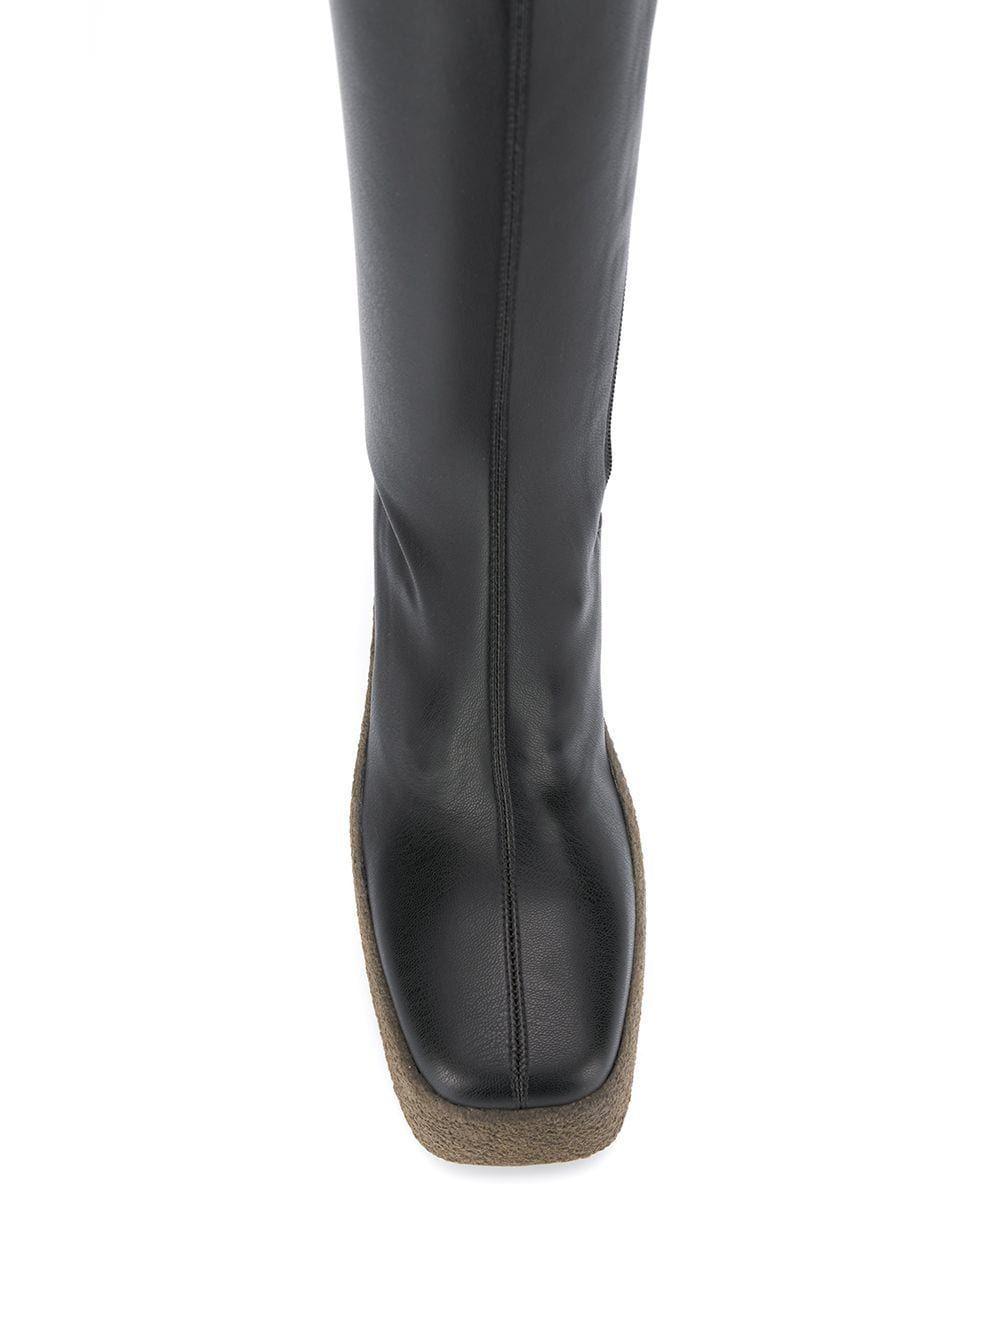 STELLA MCCARTNEY WOMEN'S 594131W1CV01000 BLACK POLYURETHANE BOOTS